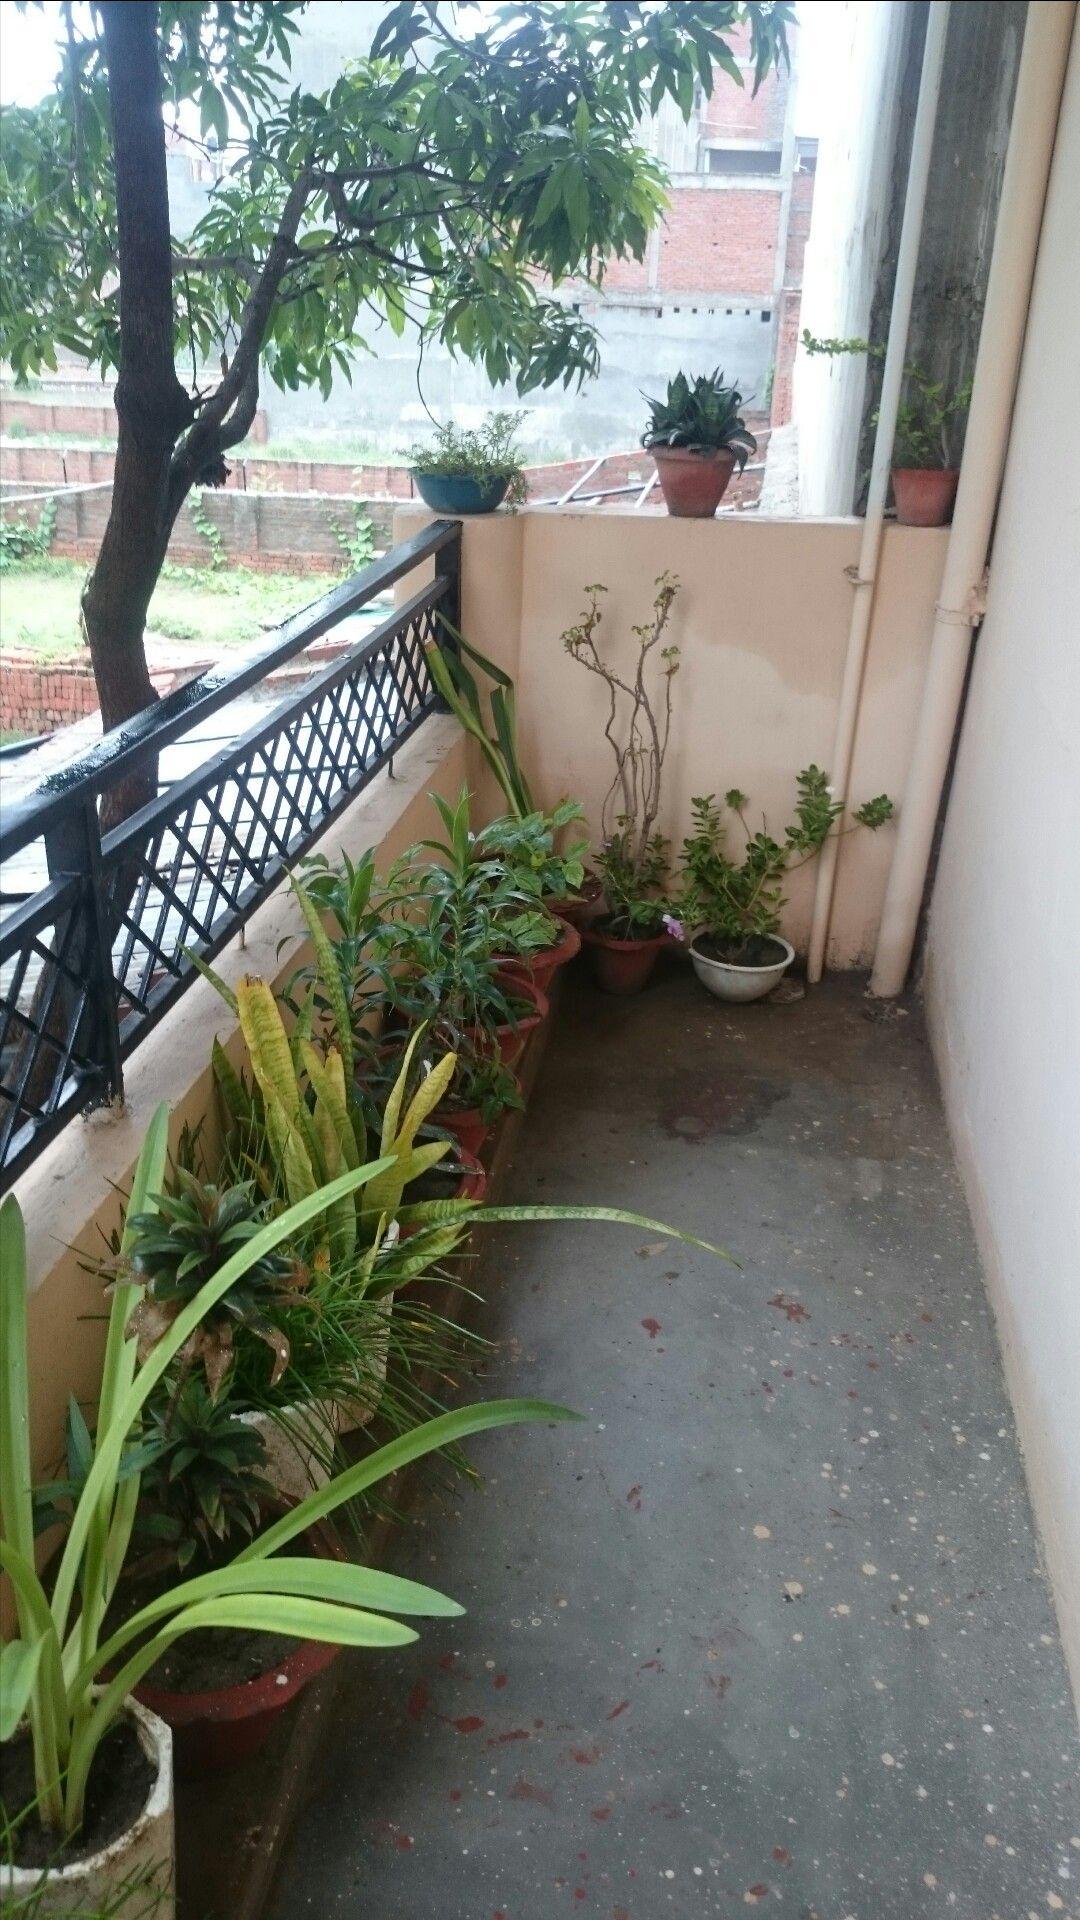 Pin by Jessica Ruth on Simple Balcony gardening | Balcony garden ...